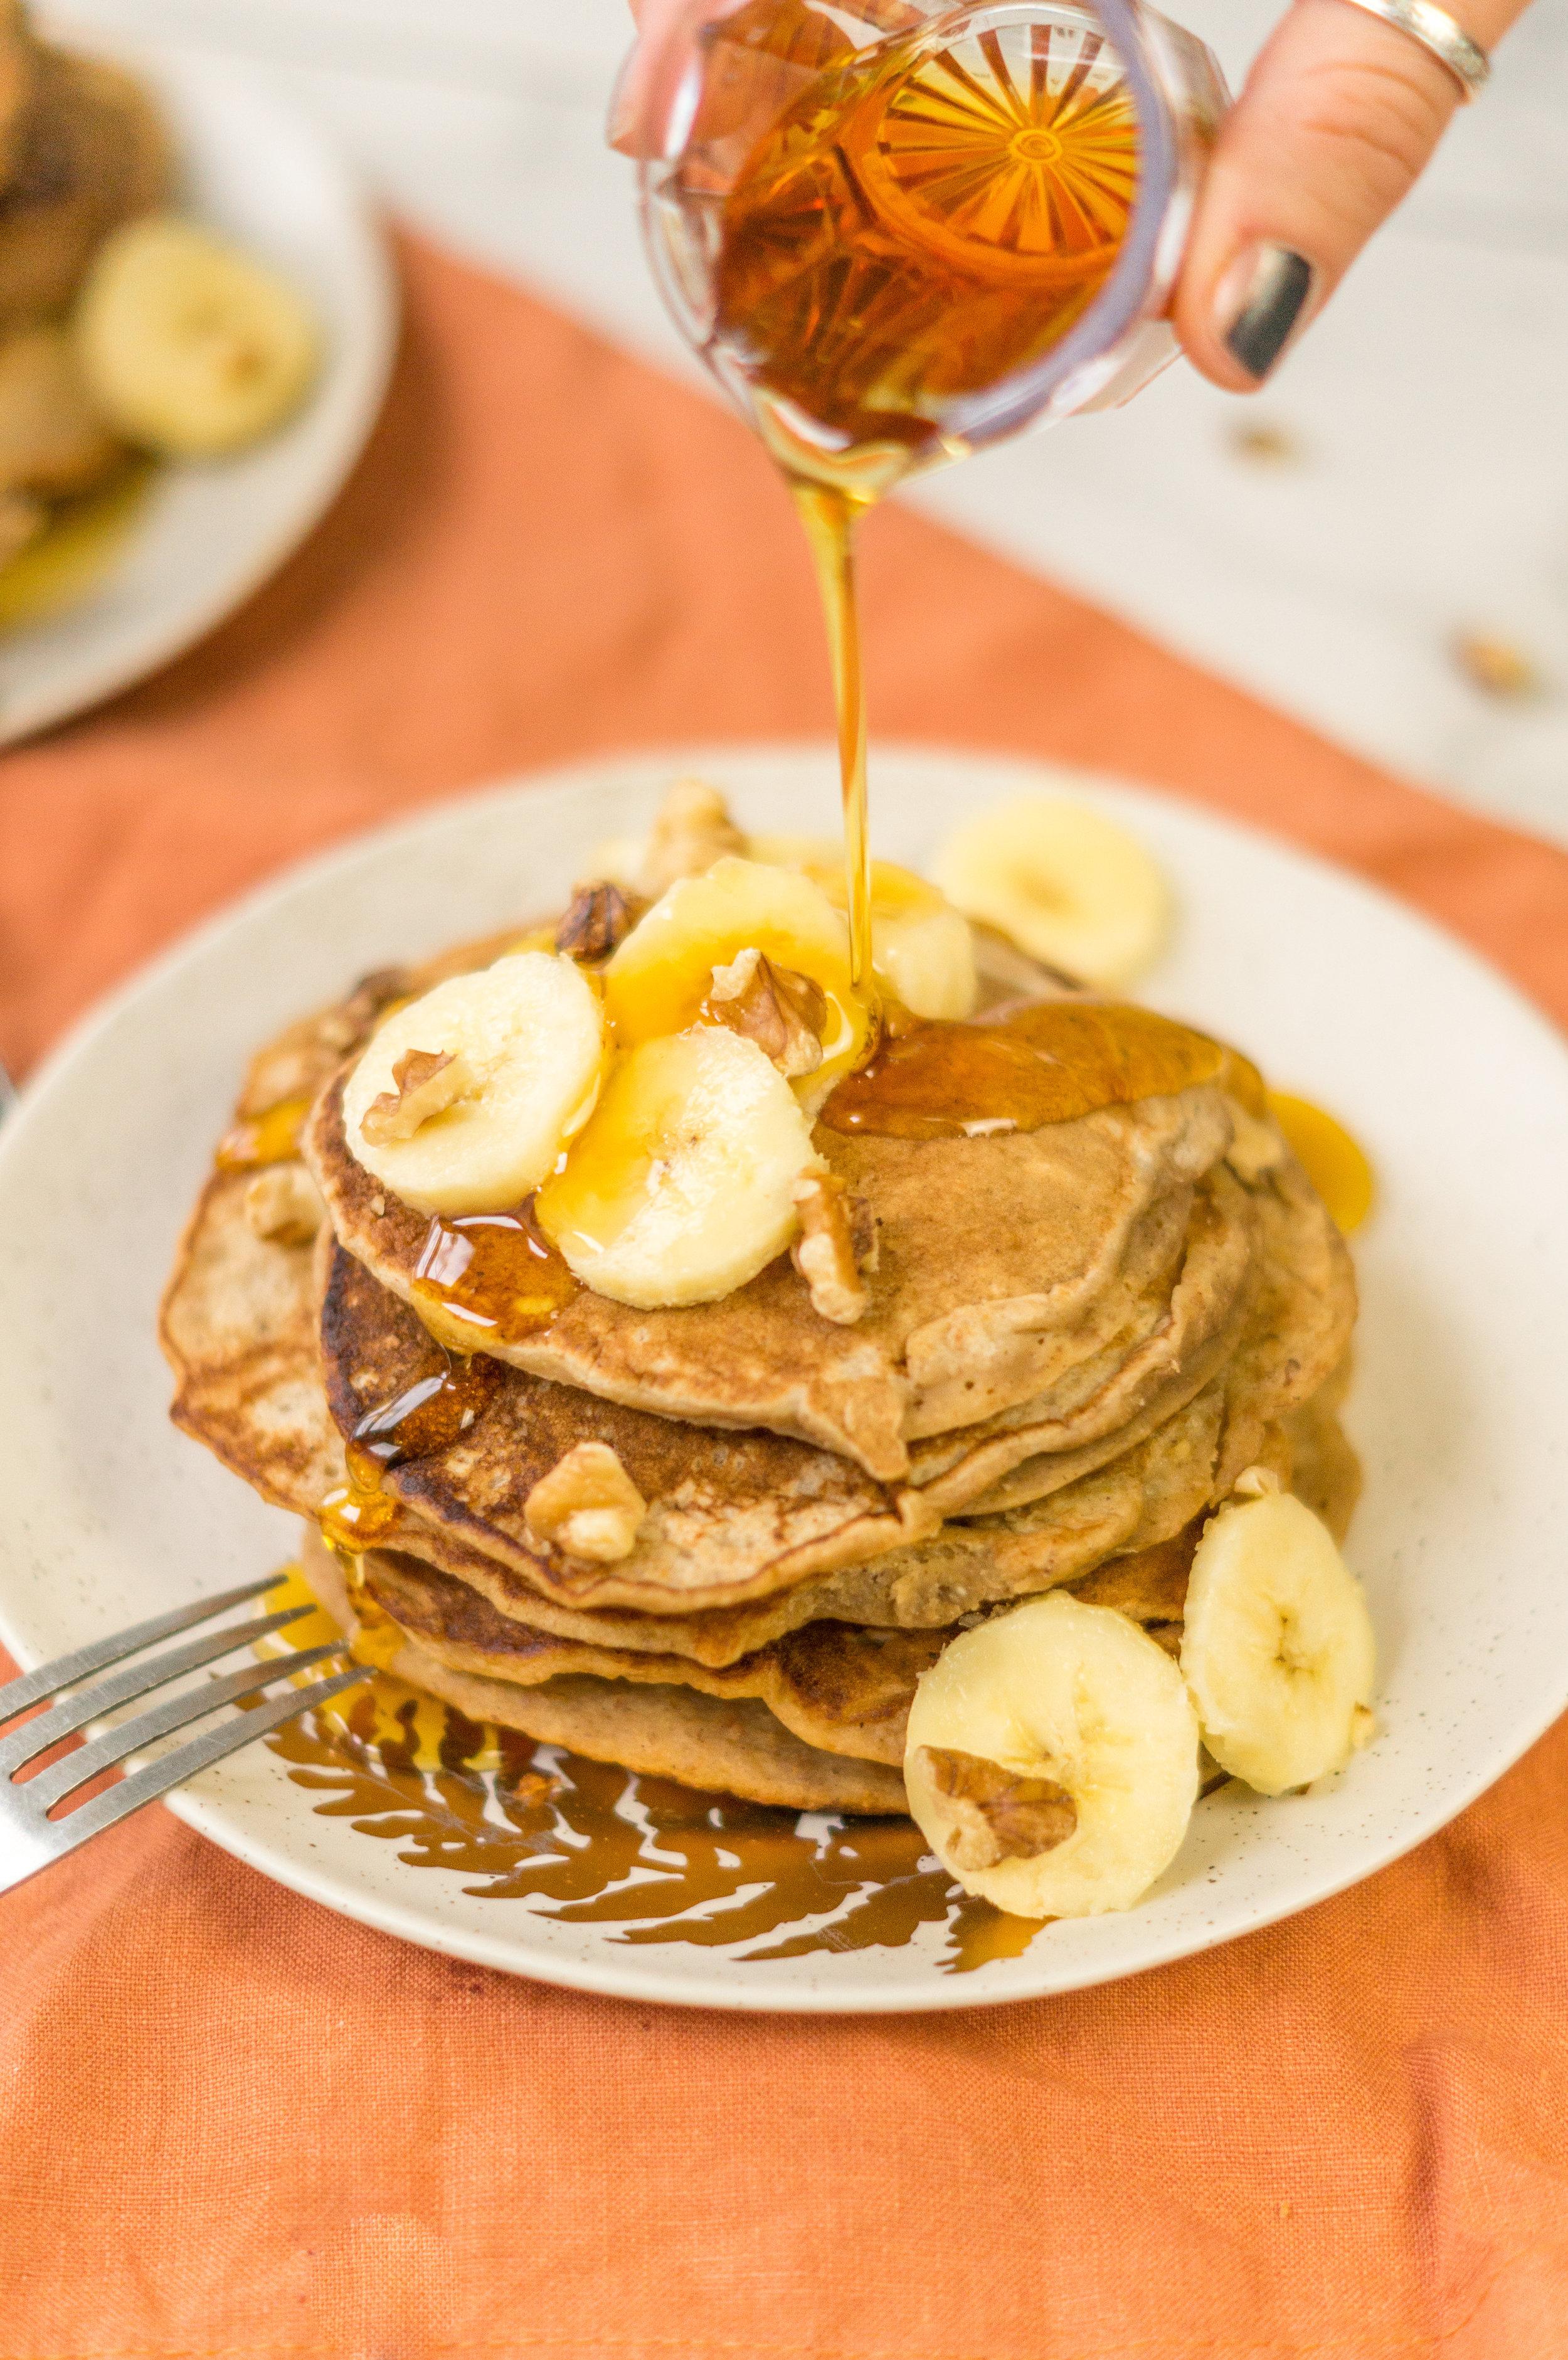 i am rorie, i am rorie recipes, whole foods, vegan food, vegan breakfast, vegan food, vegan breakfast recipes, breakfast recipes, pancake mix, bob's red mill, bob's red mill pancake mix, pancake mix, gluten free pancake mix, paleo pancake mix, gf pancake mix, bananas, mashed bananas, bananas as egg substitute, sub banana for eggs, egg substitute, cinnamon, cinnamon powder, ground cinnamon, vegetable oil, canola oil, milk, almond milk, plant milk, nondairy milk, vegan milk, vegan weekend, vegan brunch, vegan pancakes, easy pancake recipe, quick pancake recipe, banana walnut pancakes, chicago vegan blog, vegan blogger, vegan recipes, chicago blogger, food blogger, vegan food blogger, delicious vegan food, i am rorie food, vegan comfort food, lazy vegan food, easy vegan recipe, simple vegan breakfast, simple vegan recipe